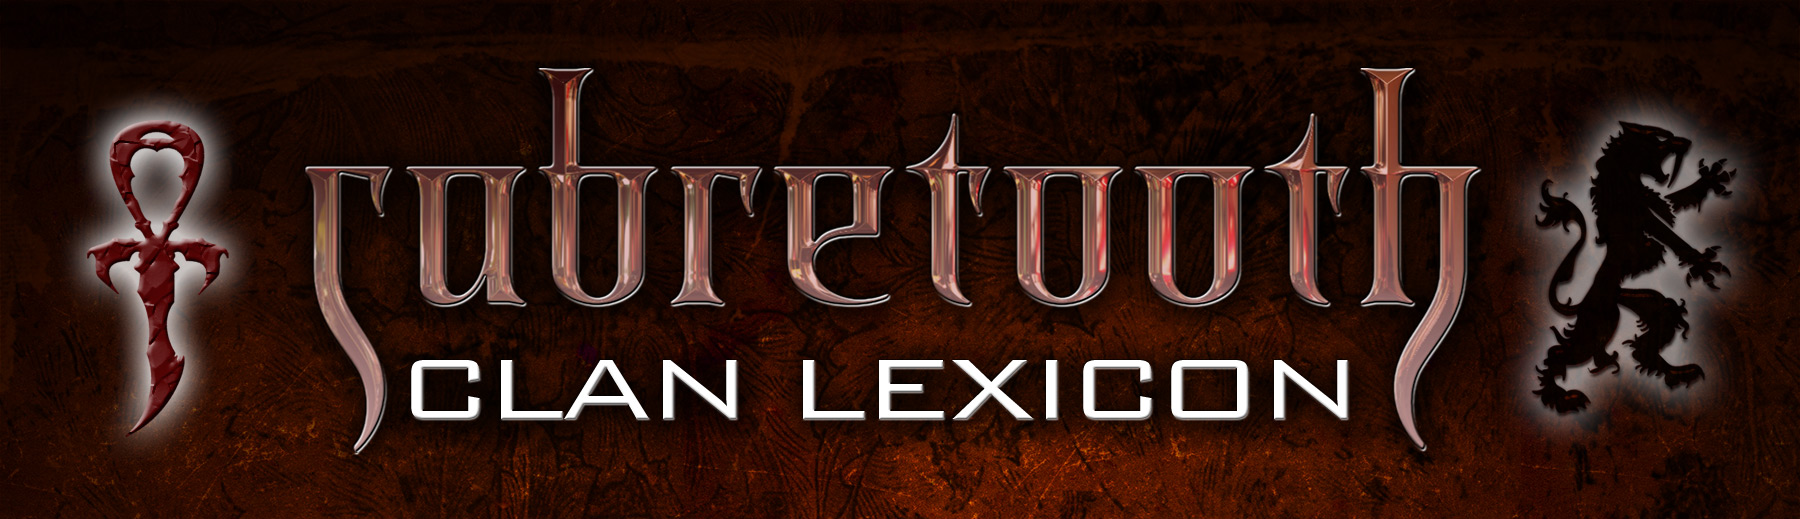 Sabretooth Clan Lexicon